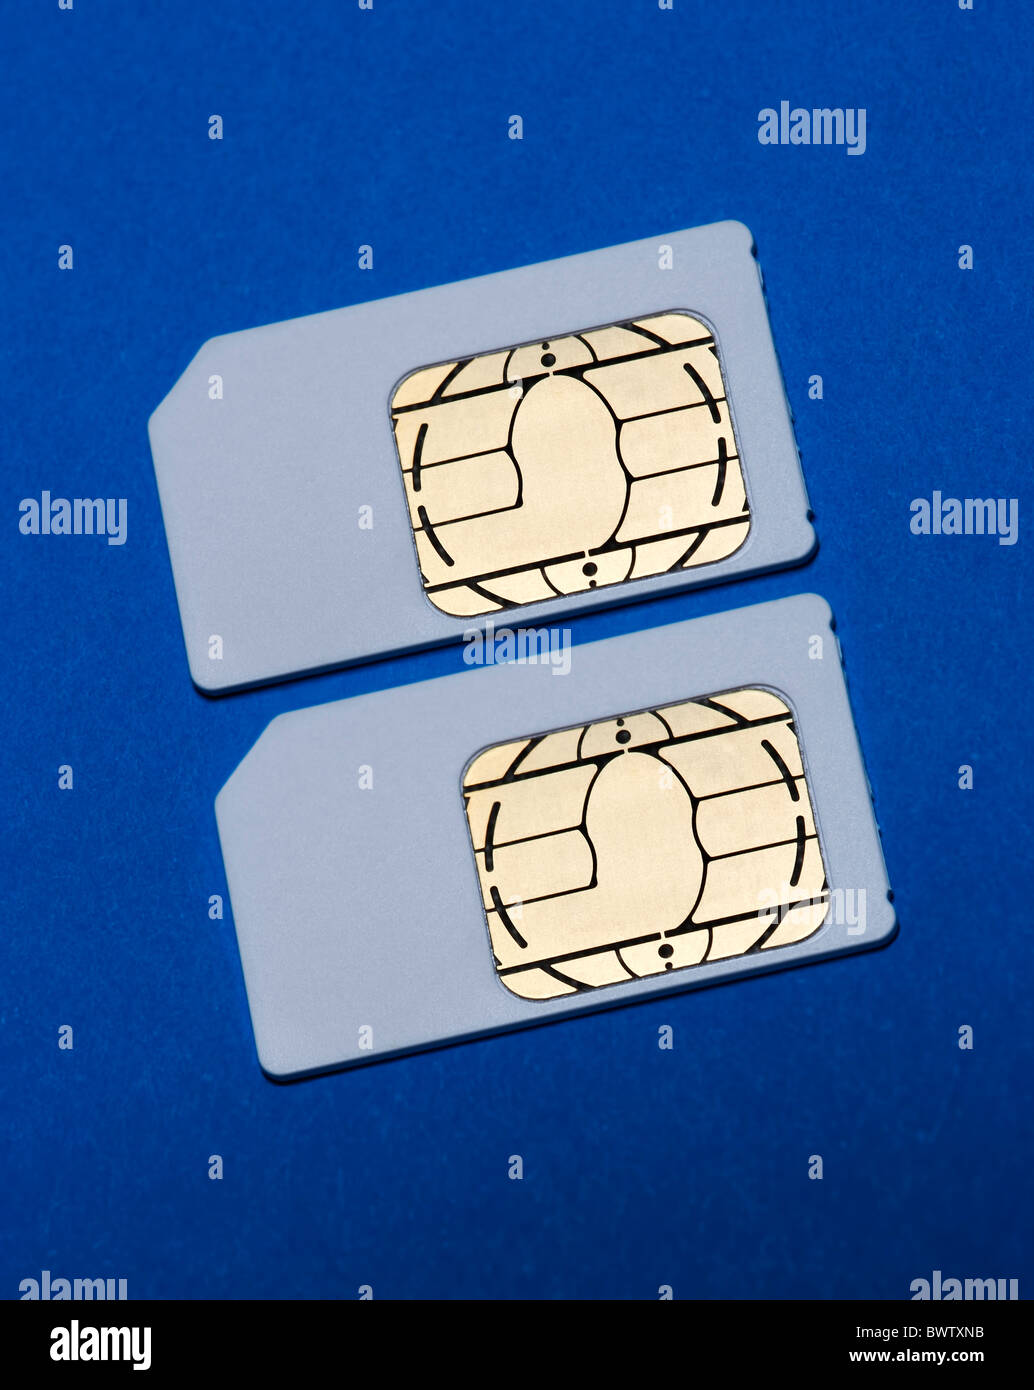 How to block a megaphone SIM card: 3 ways 35